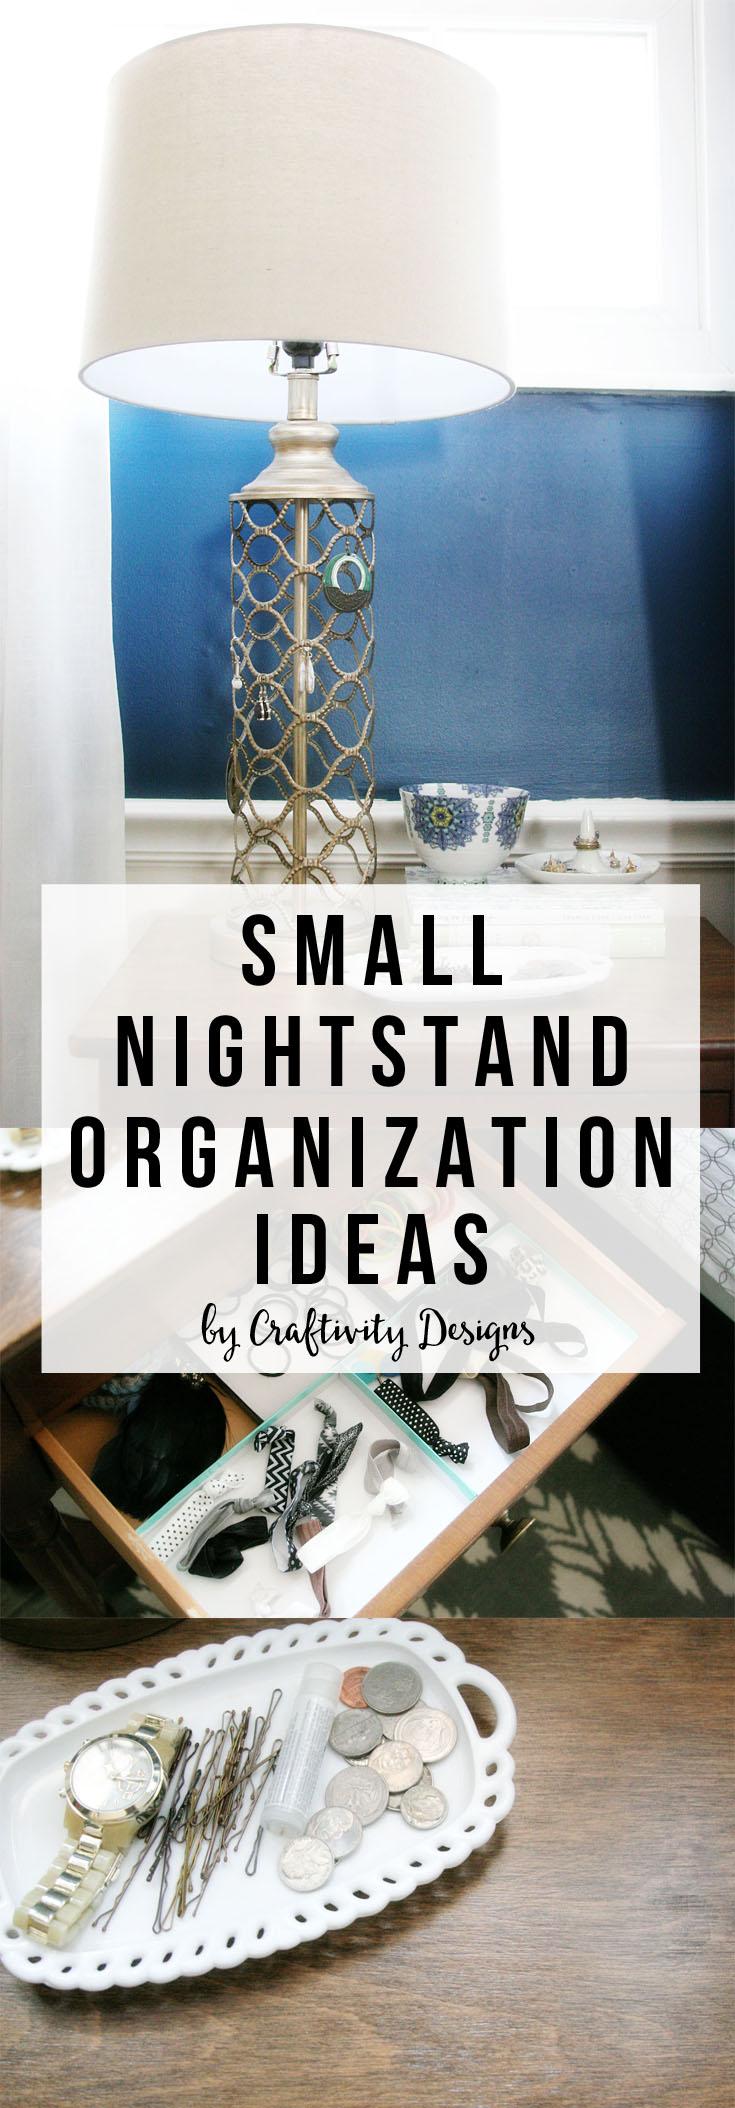 Small Nightstand Organization